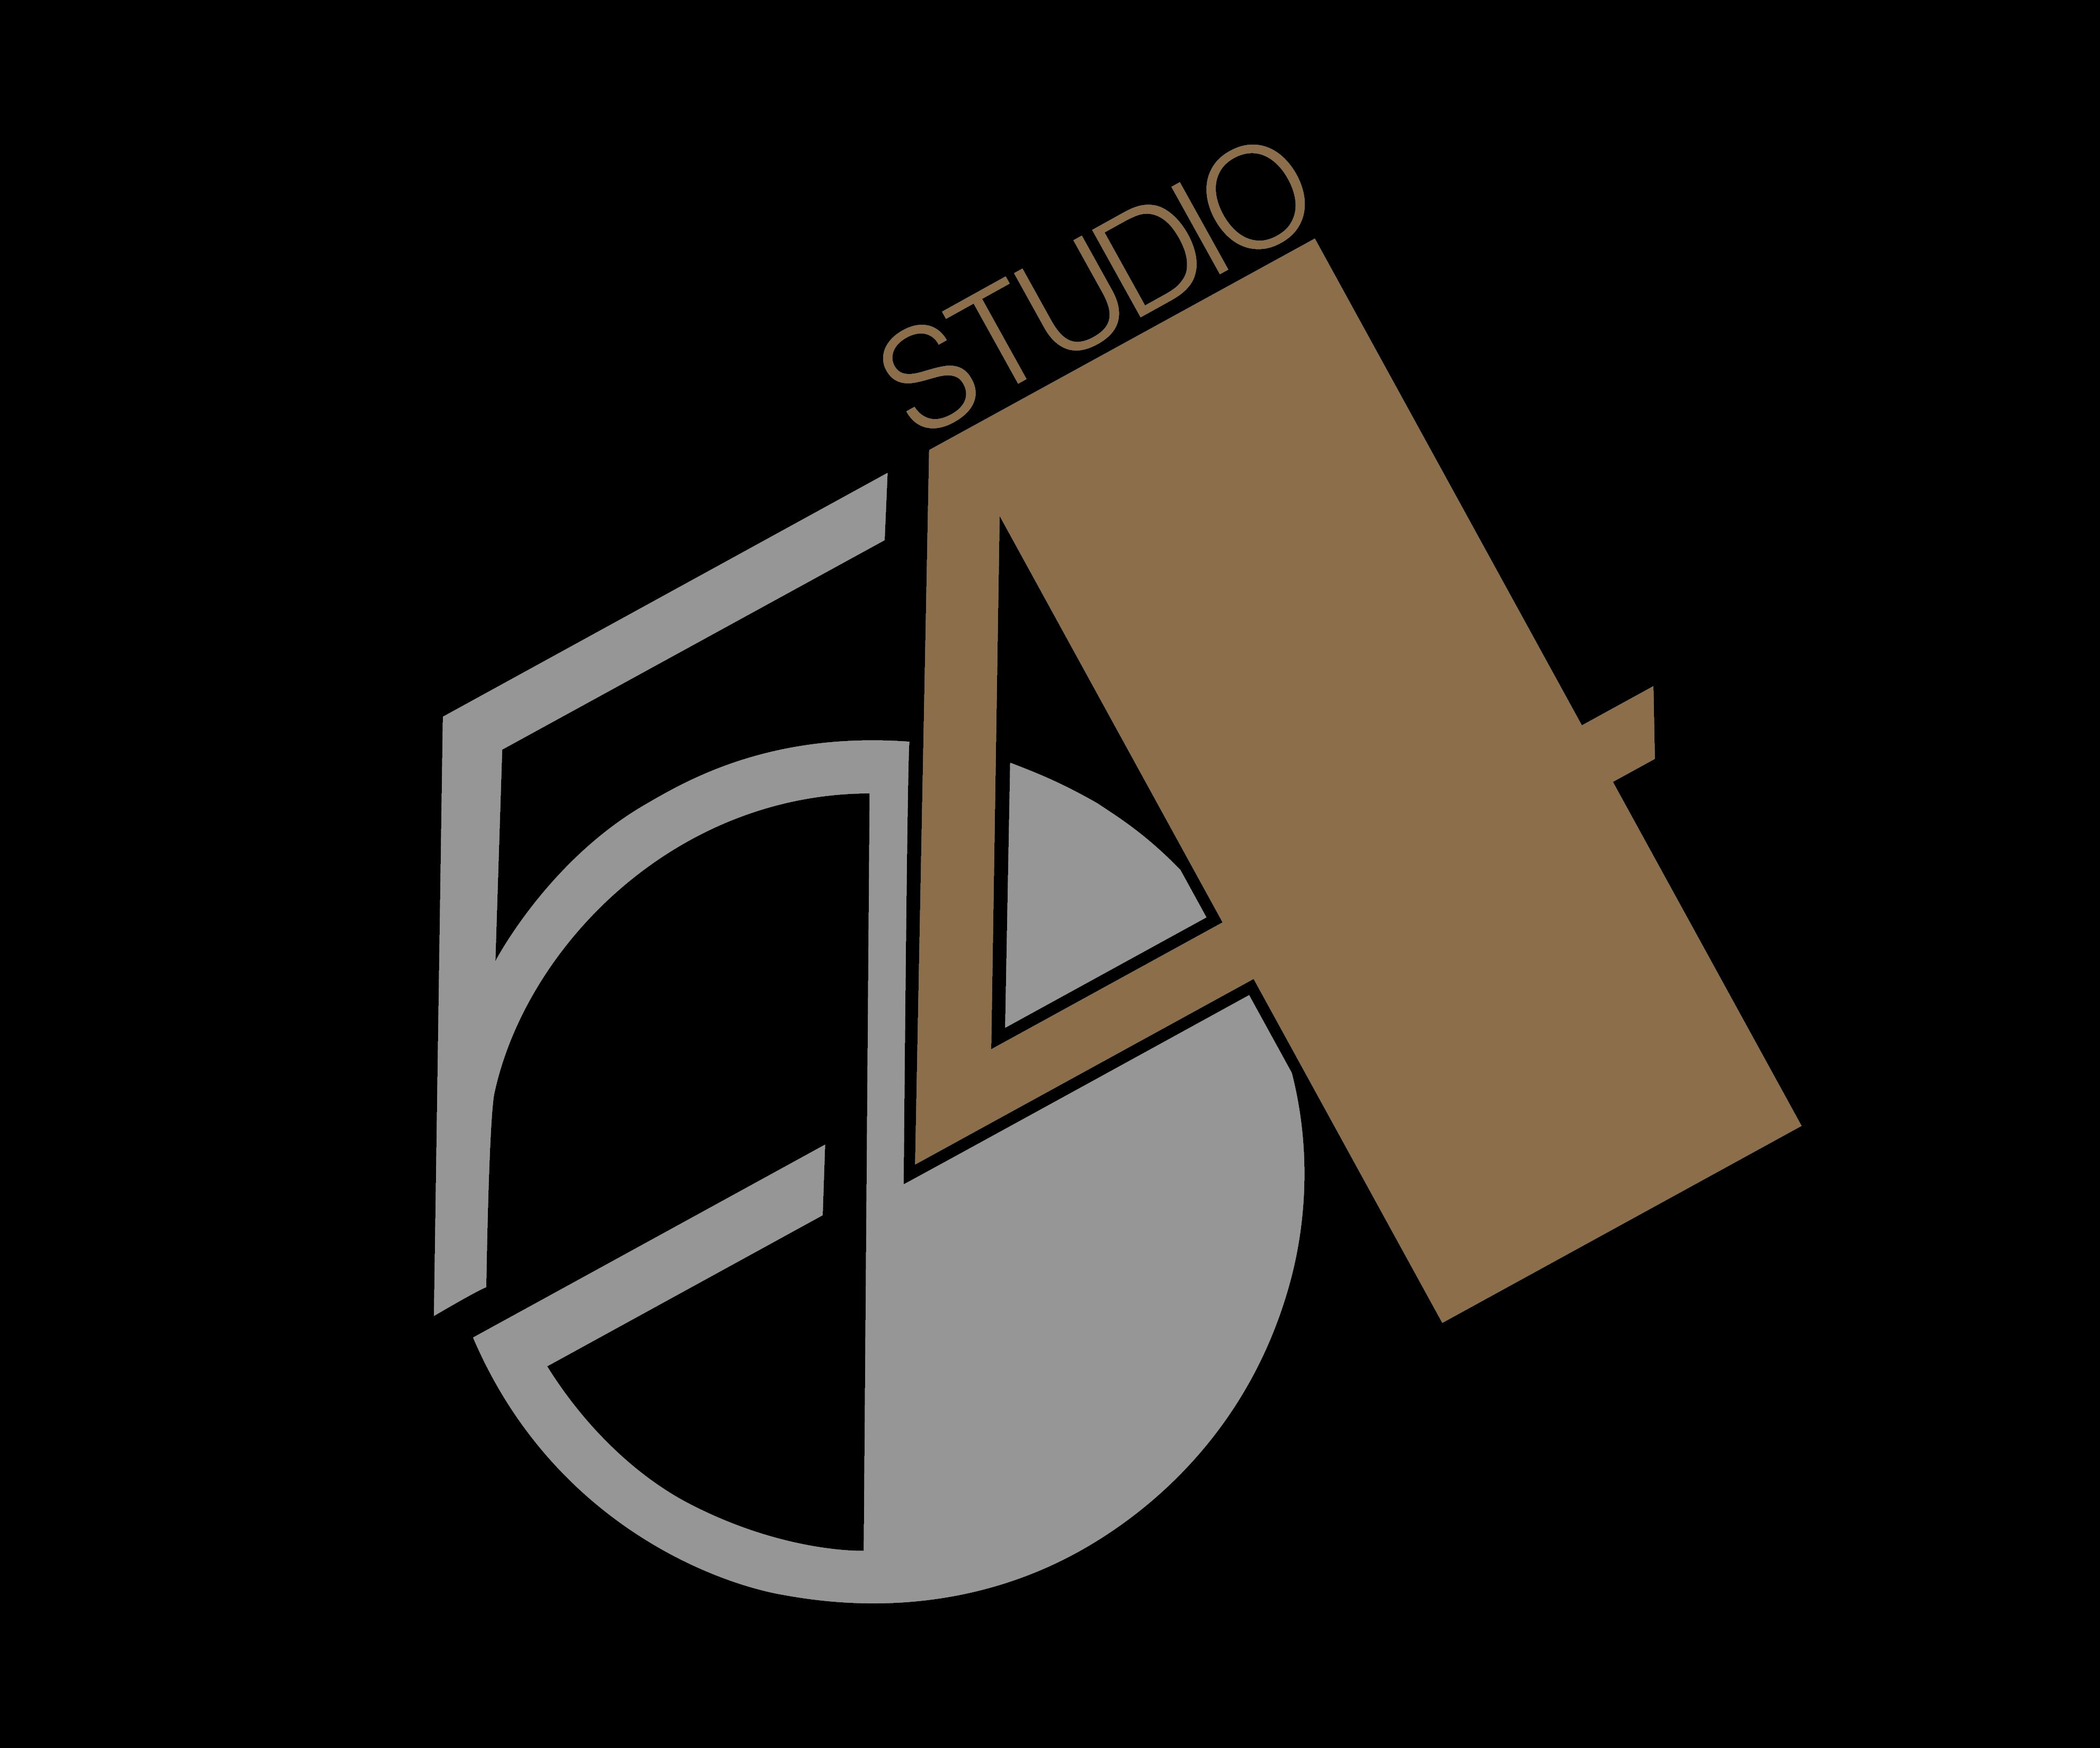 Studio 54 artwork